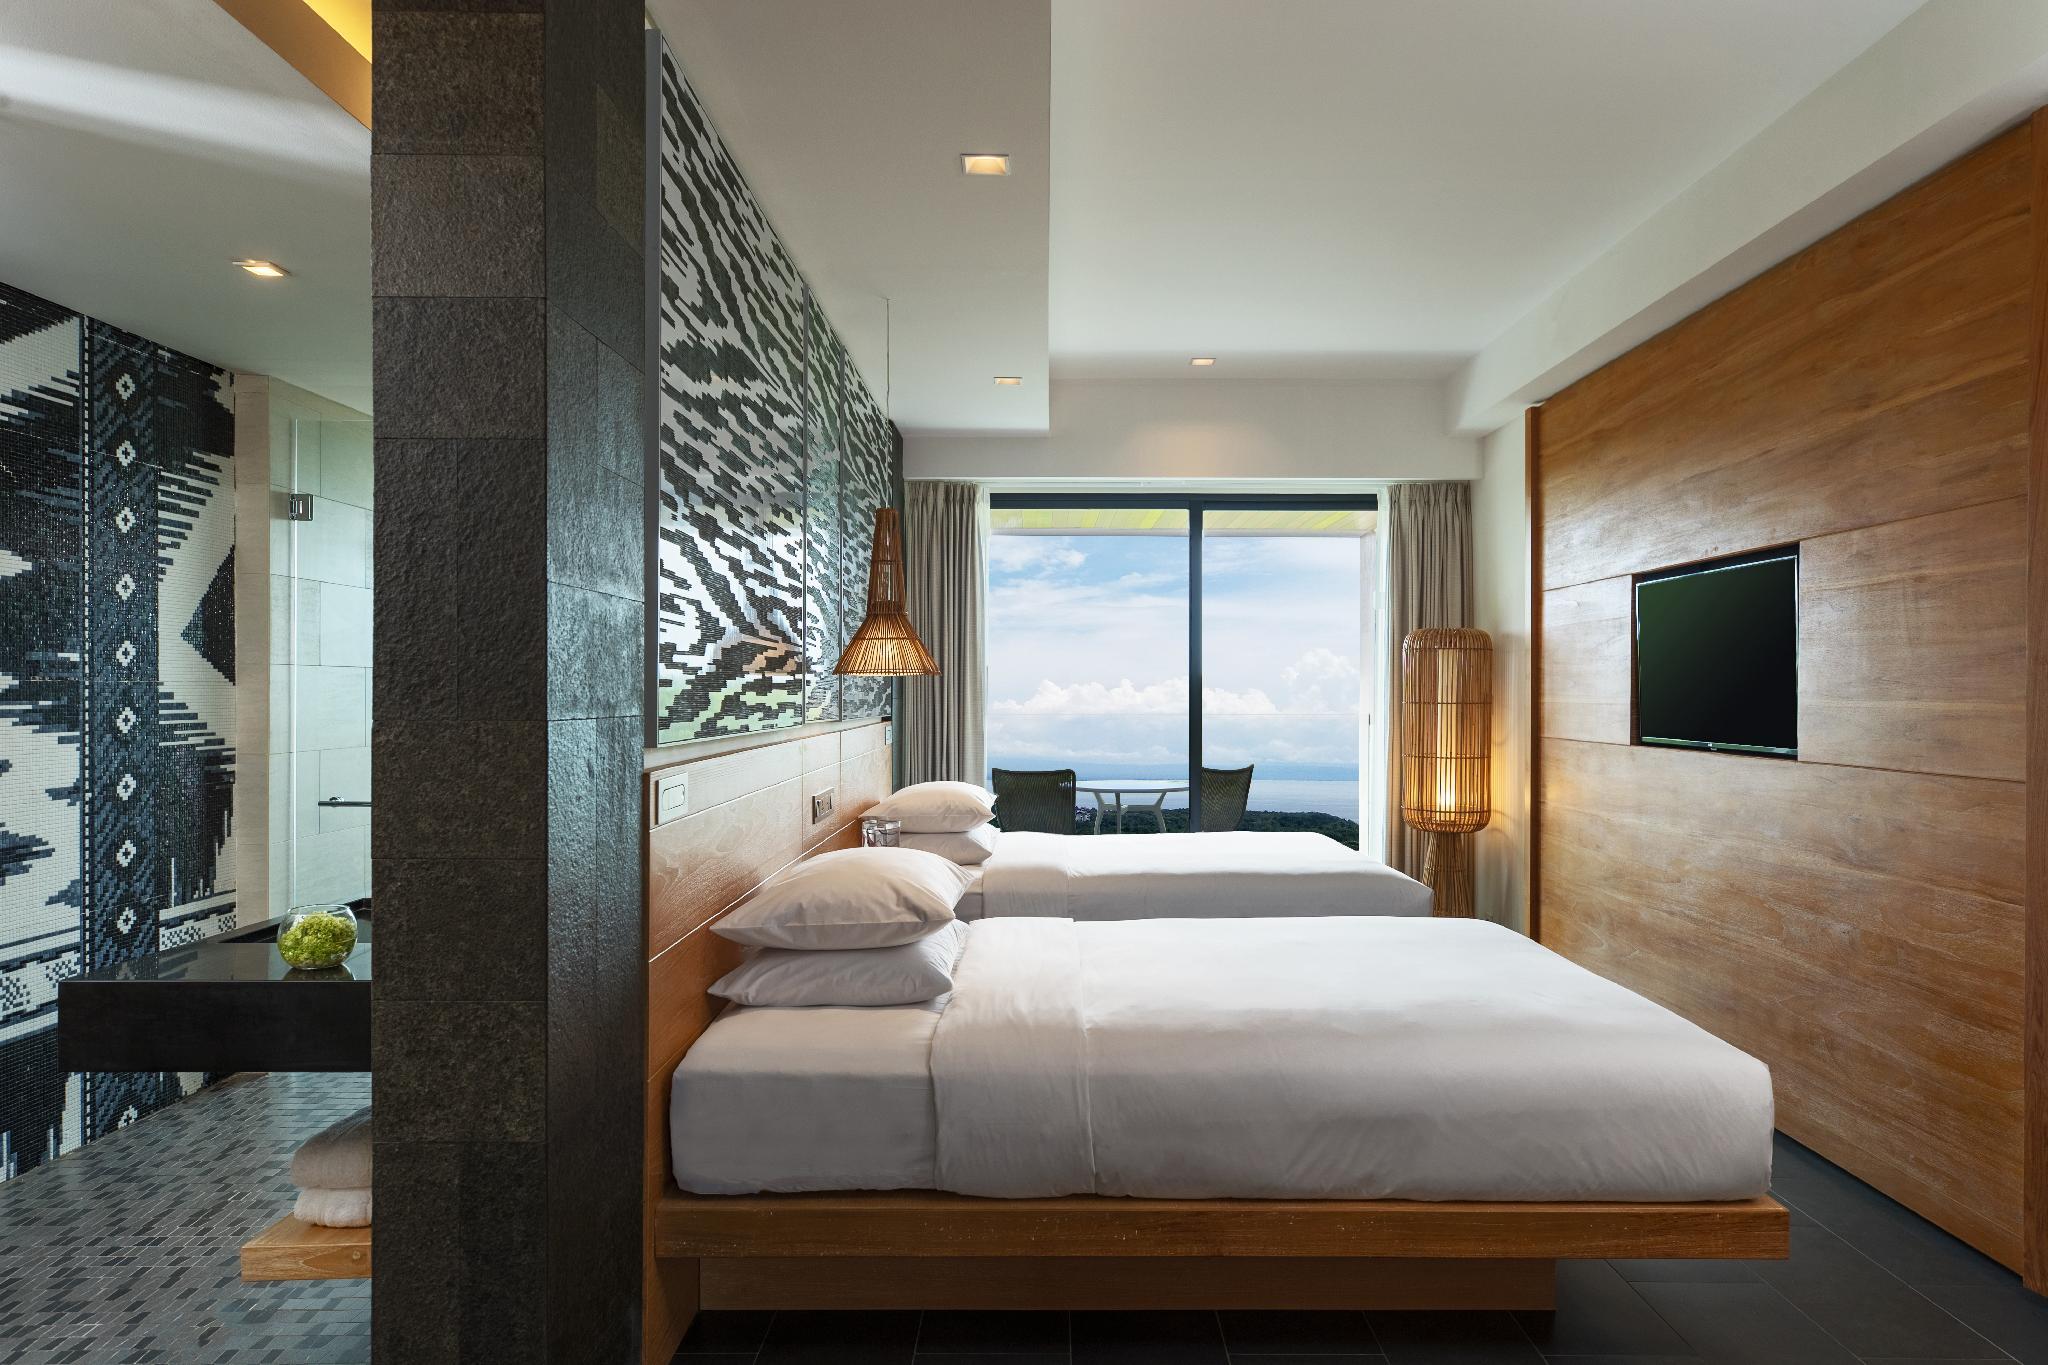 https://www.otdesign.com/wp-content/uploads/2021/04/Renaisance-Bali.jpg